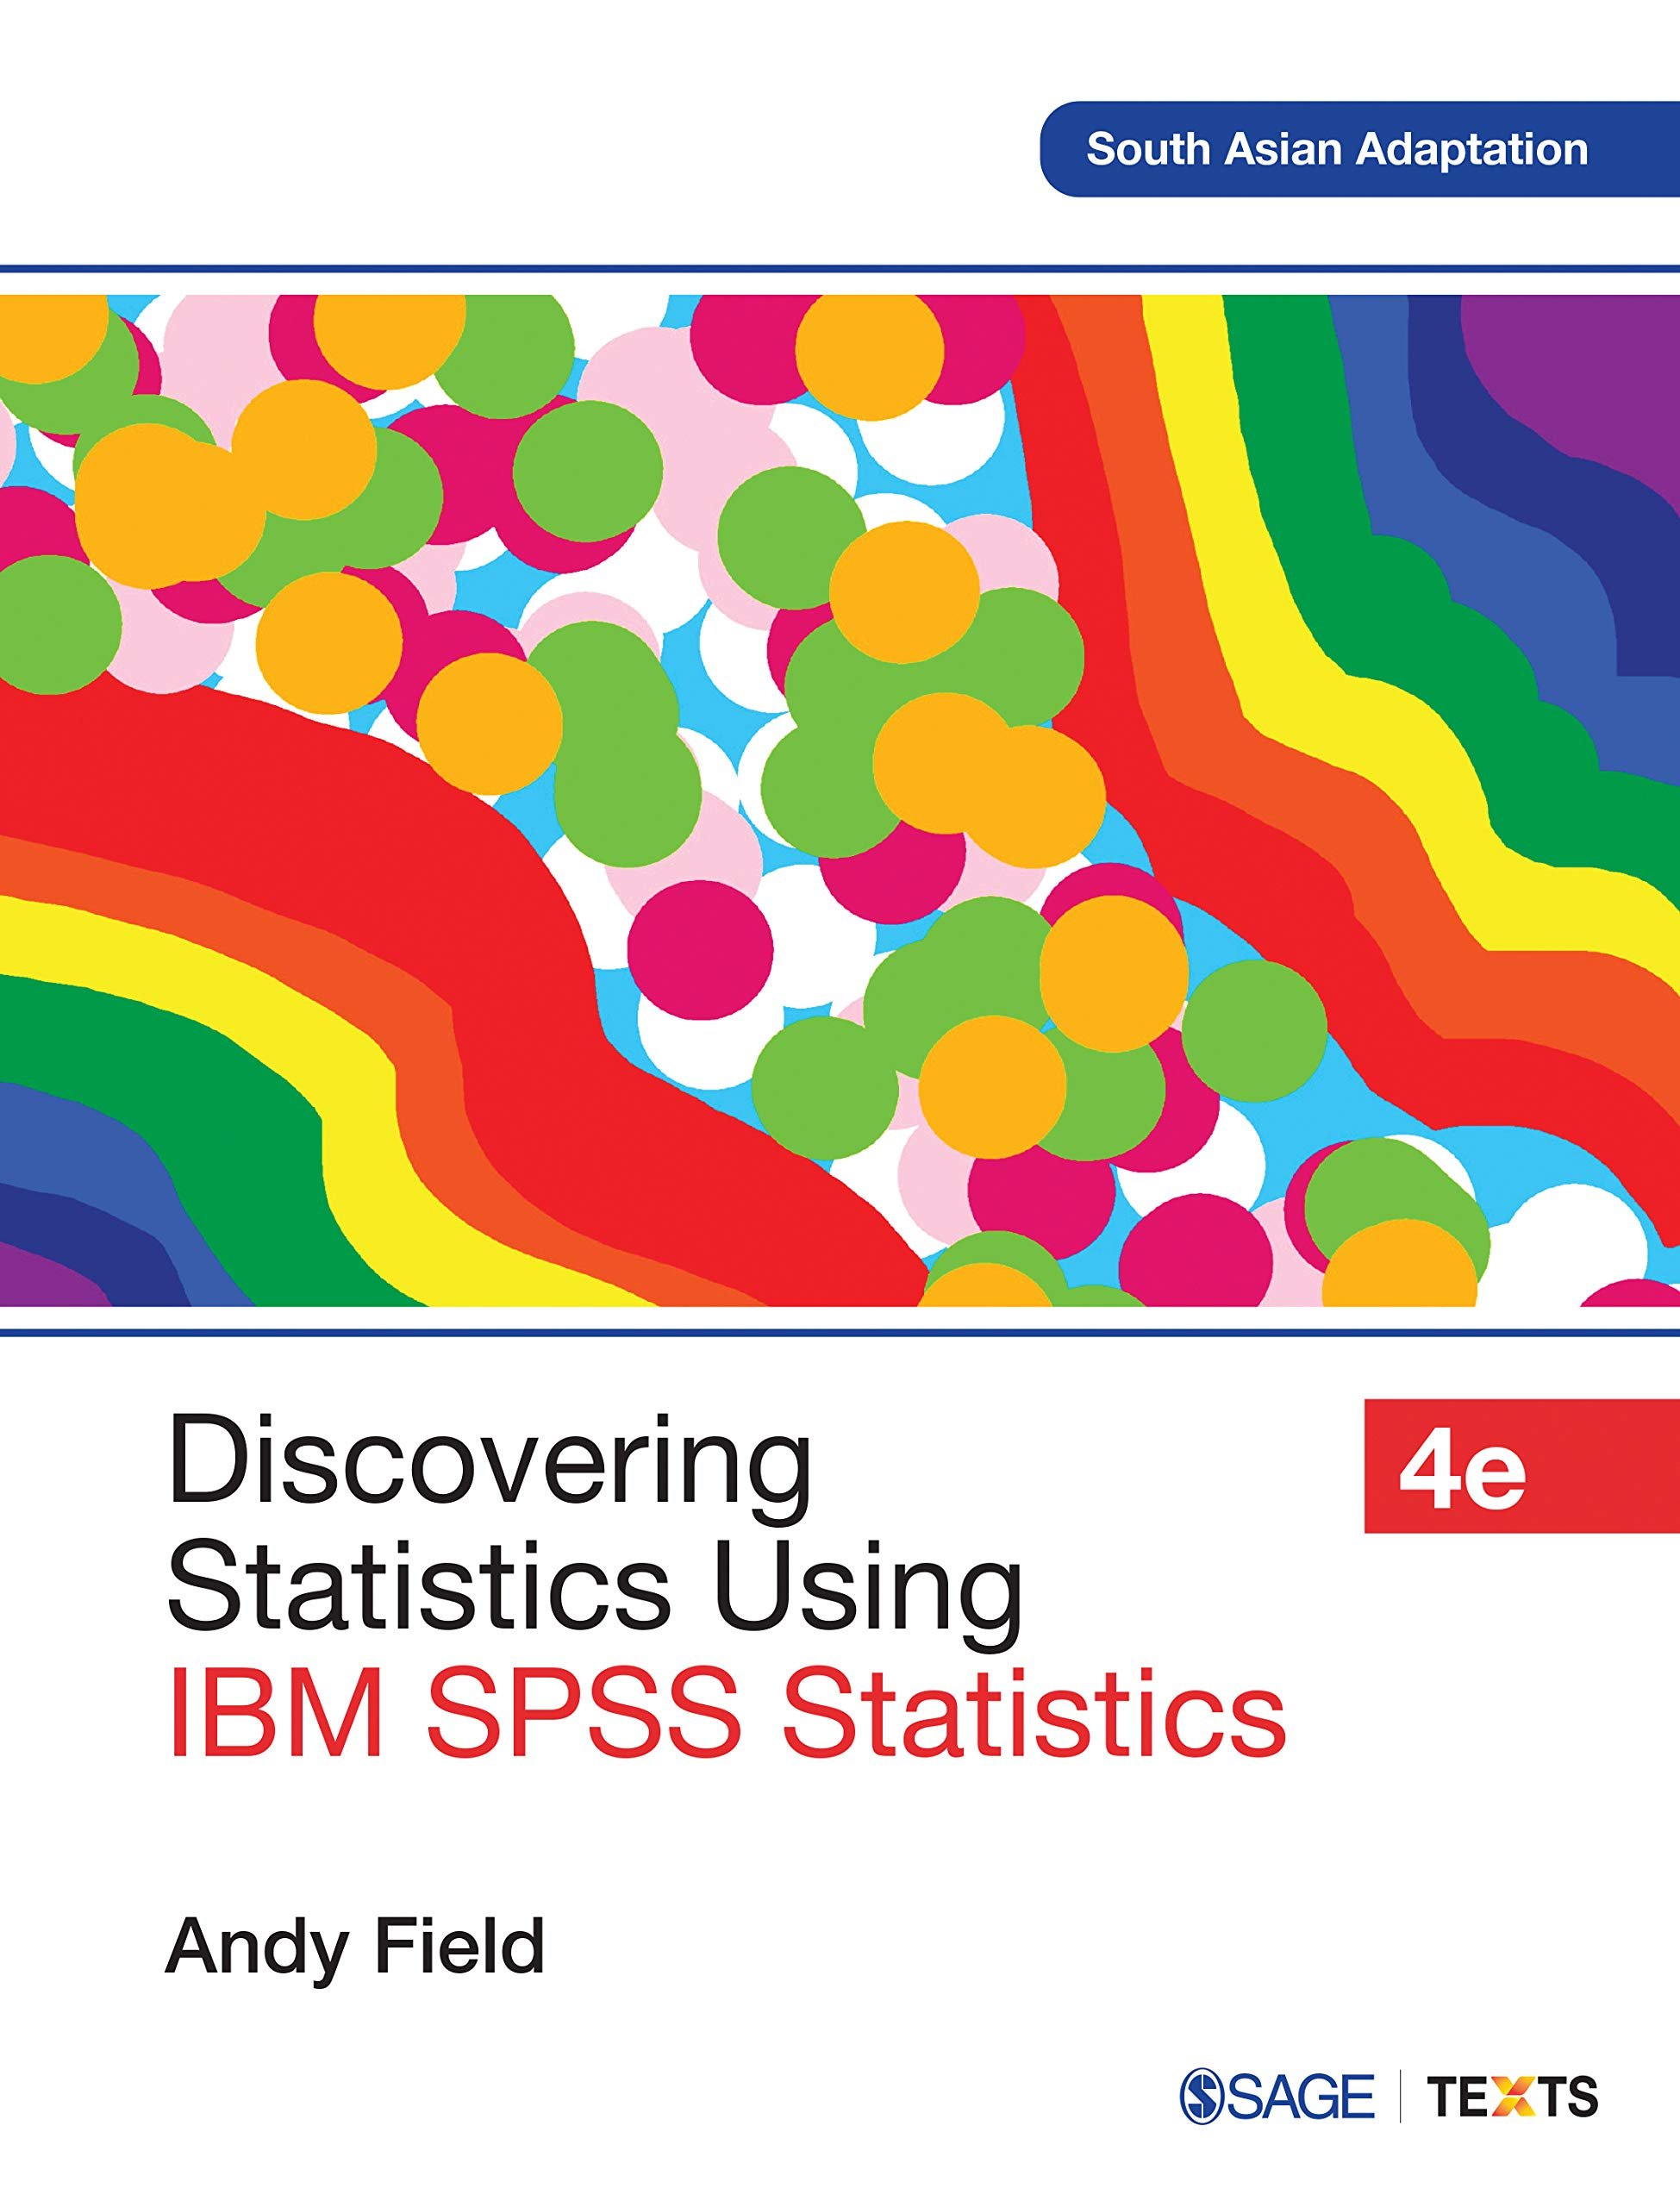 Discovering Statistics Using IBM SPSS Statistics: Amazon.es: Field, Andy: Libros en idiomas extranjeros